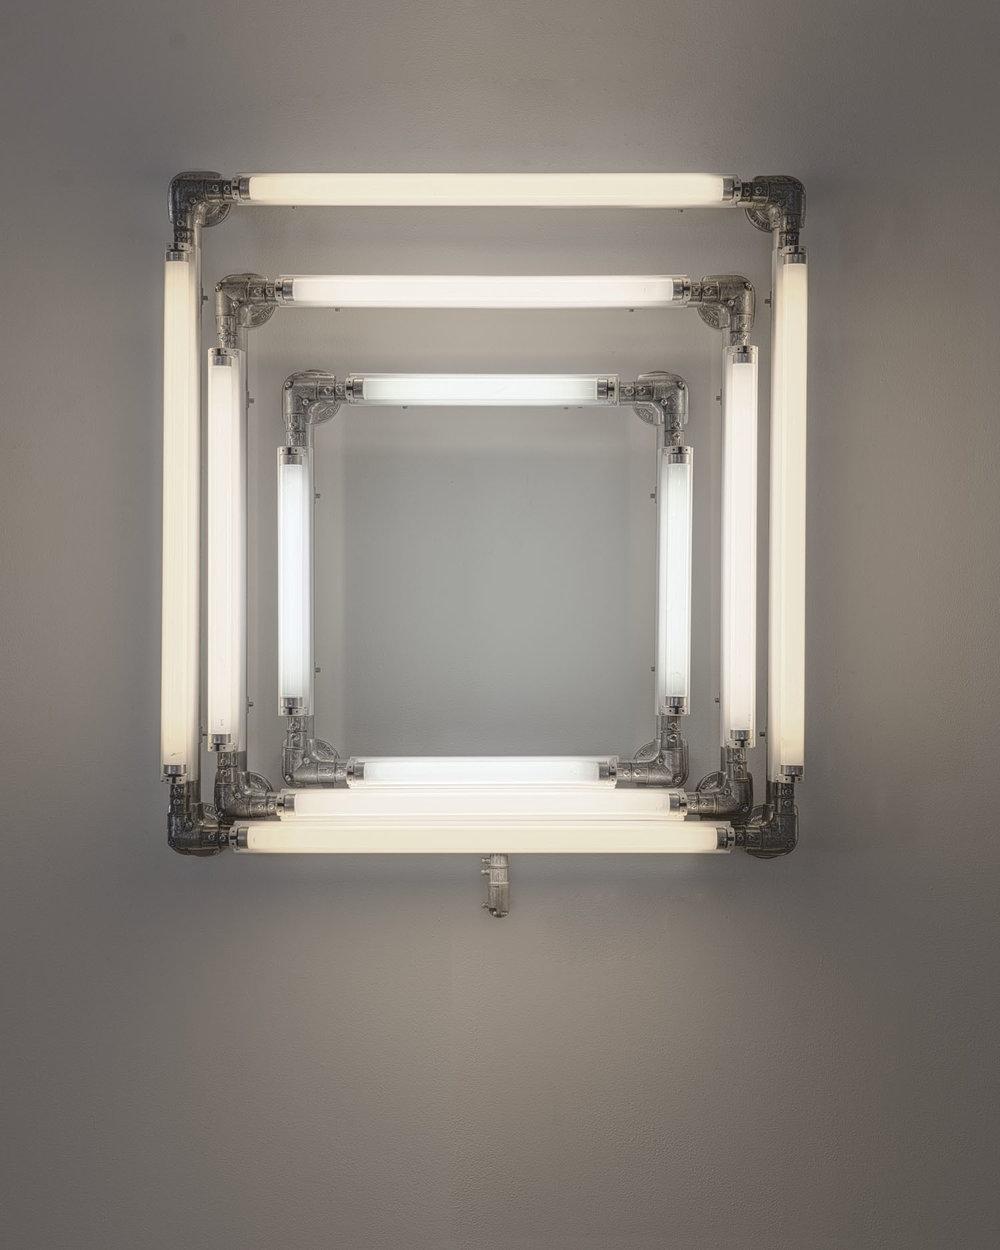 light/ALBERS: Cool White/Neutral White/Warm White